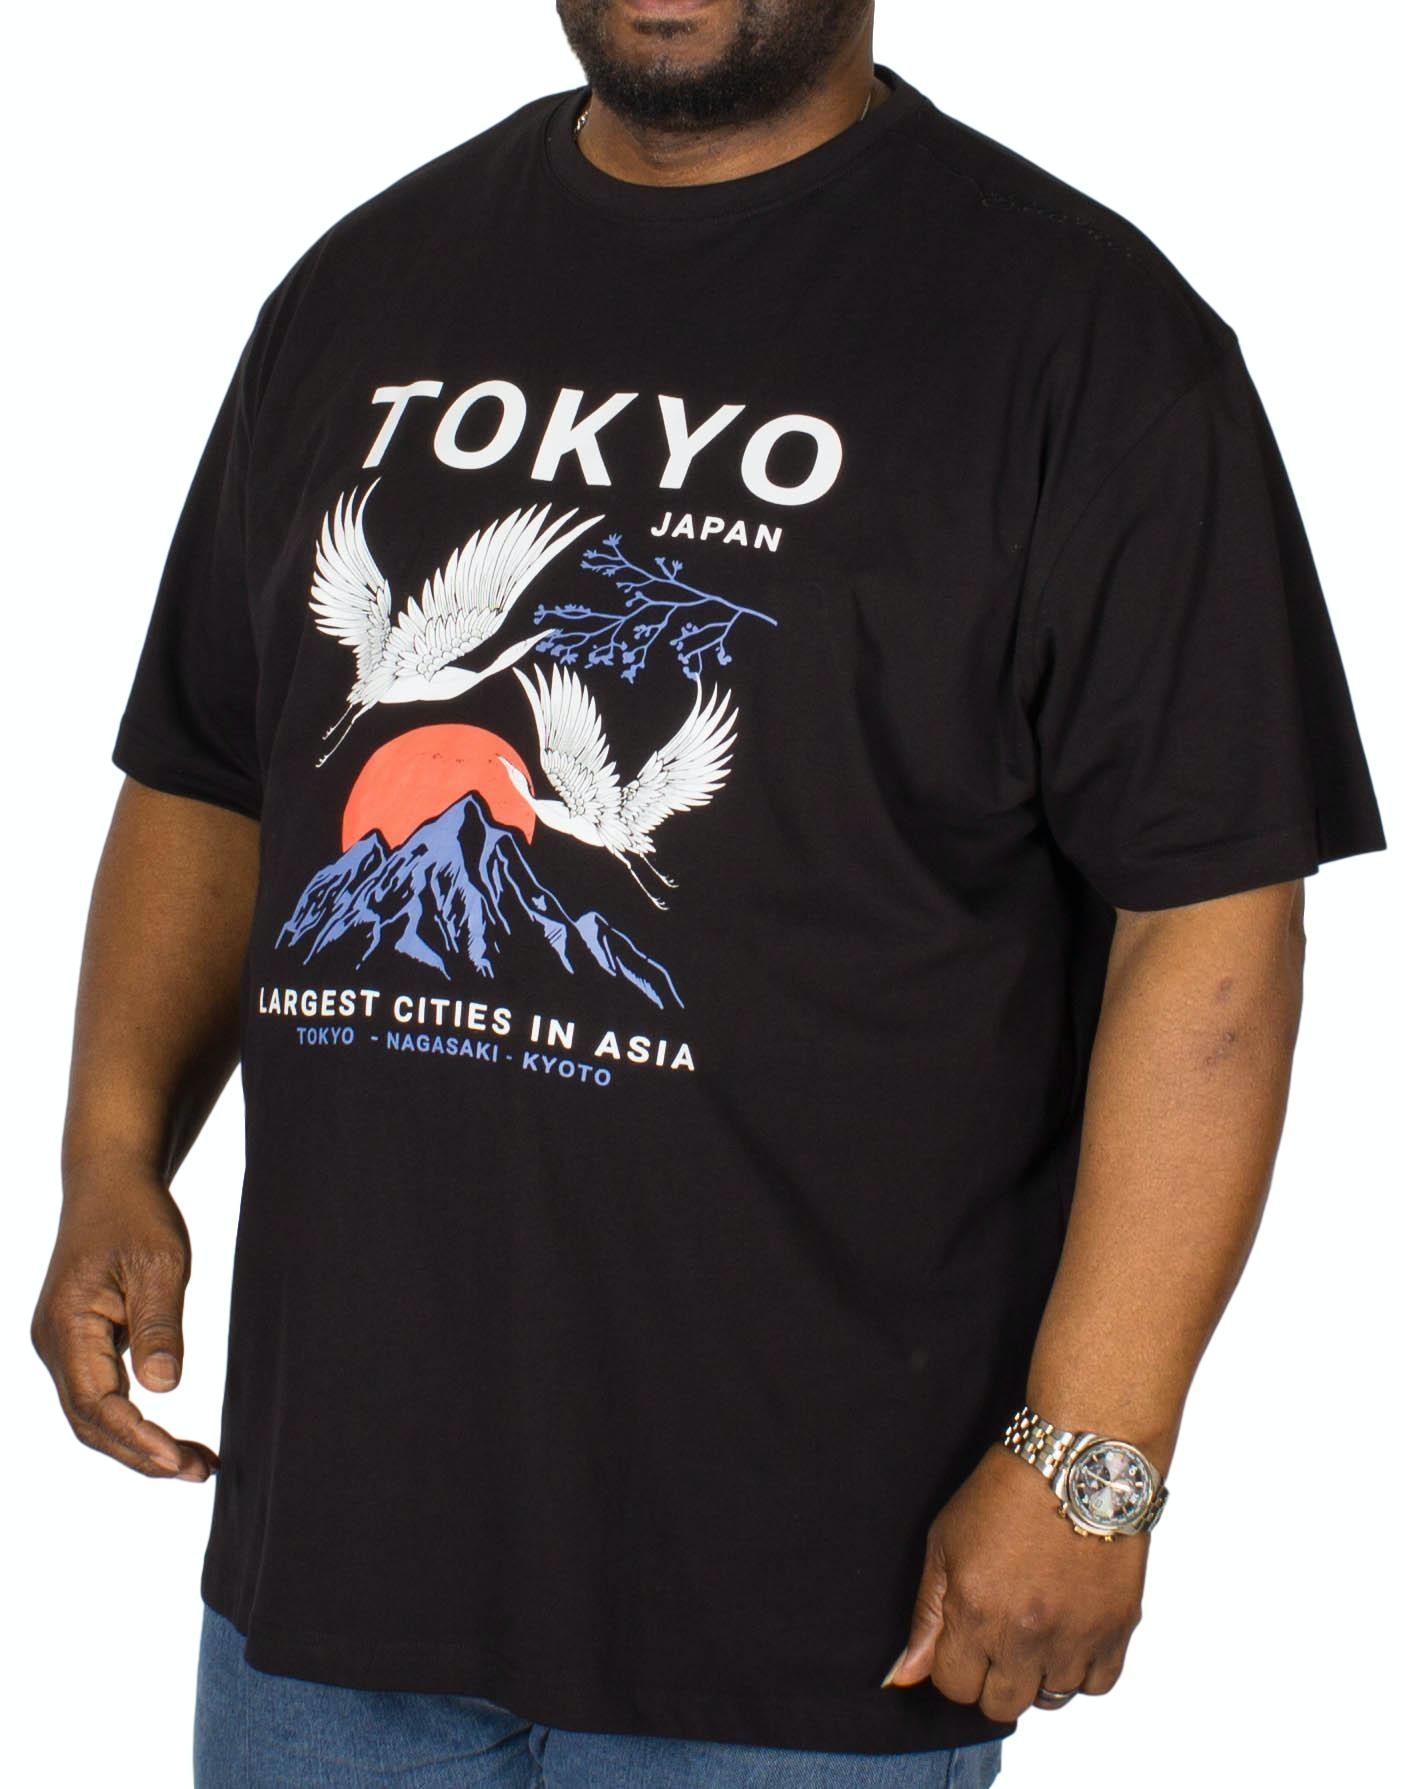 Espionage Tokyo Printed T-Shirt Black